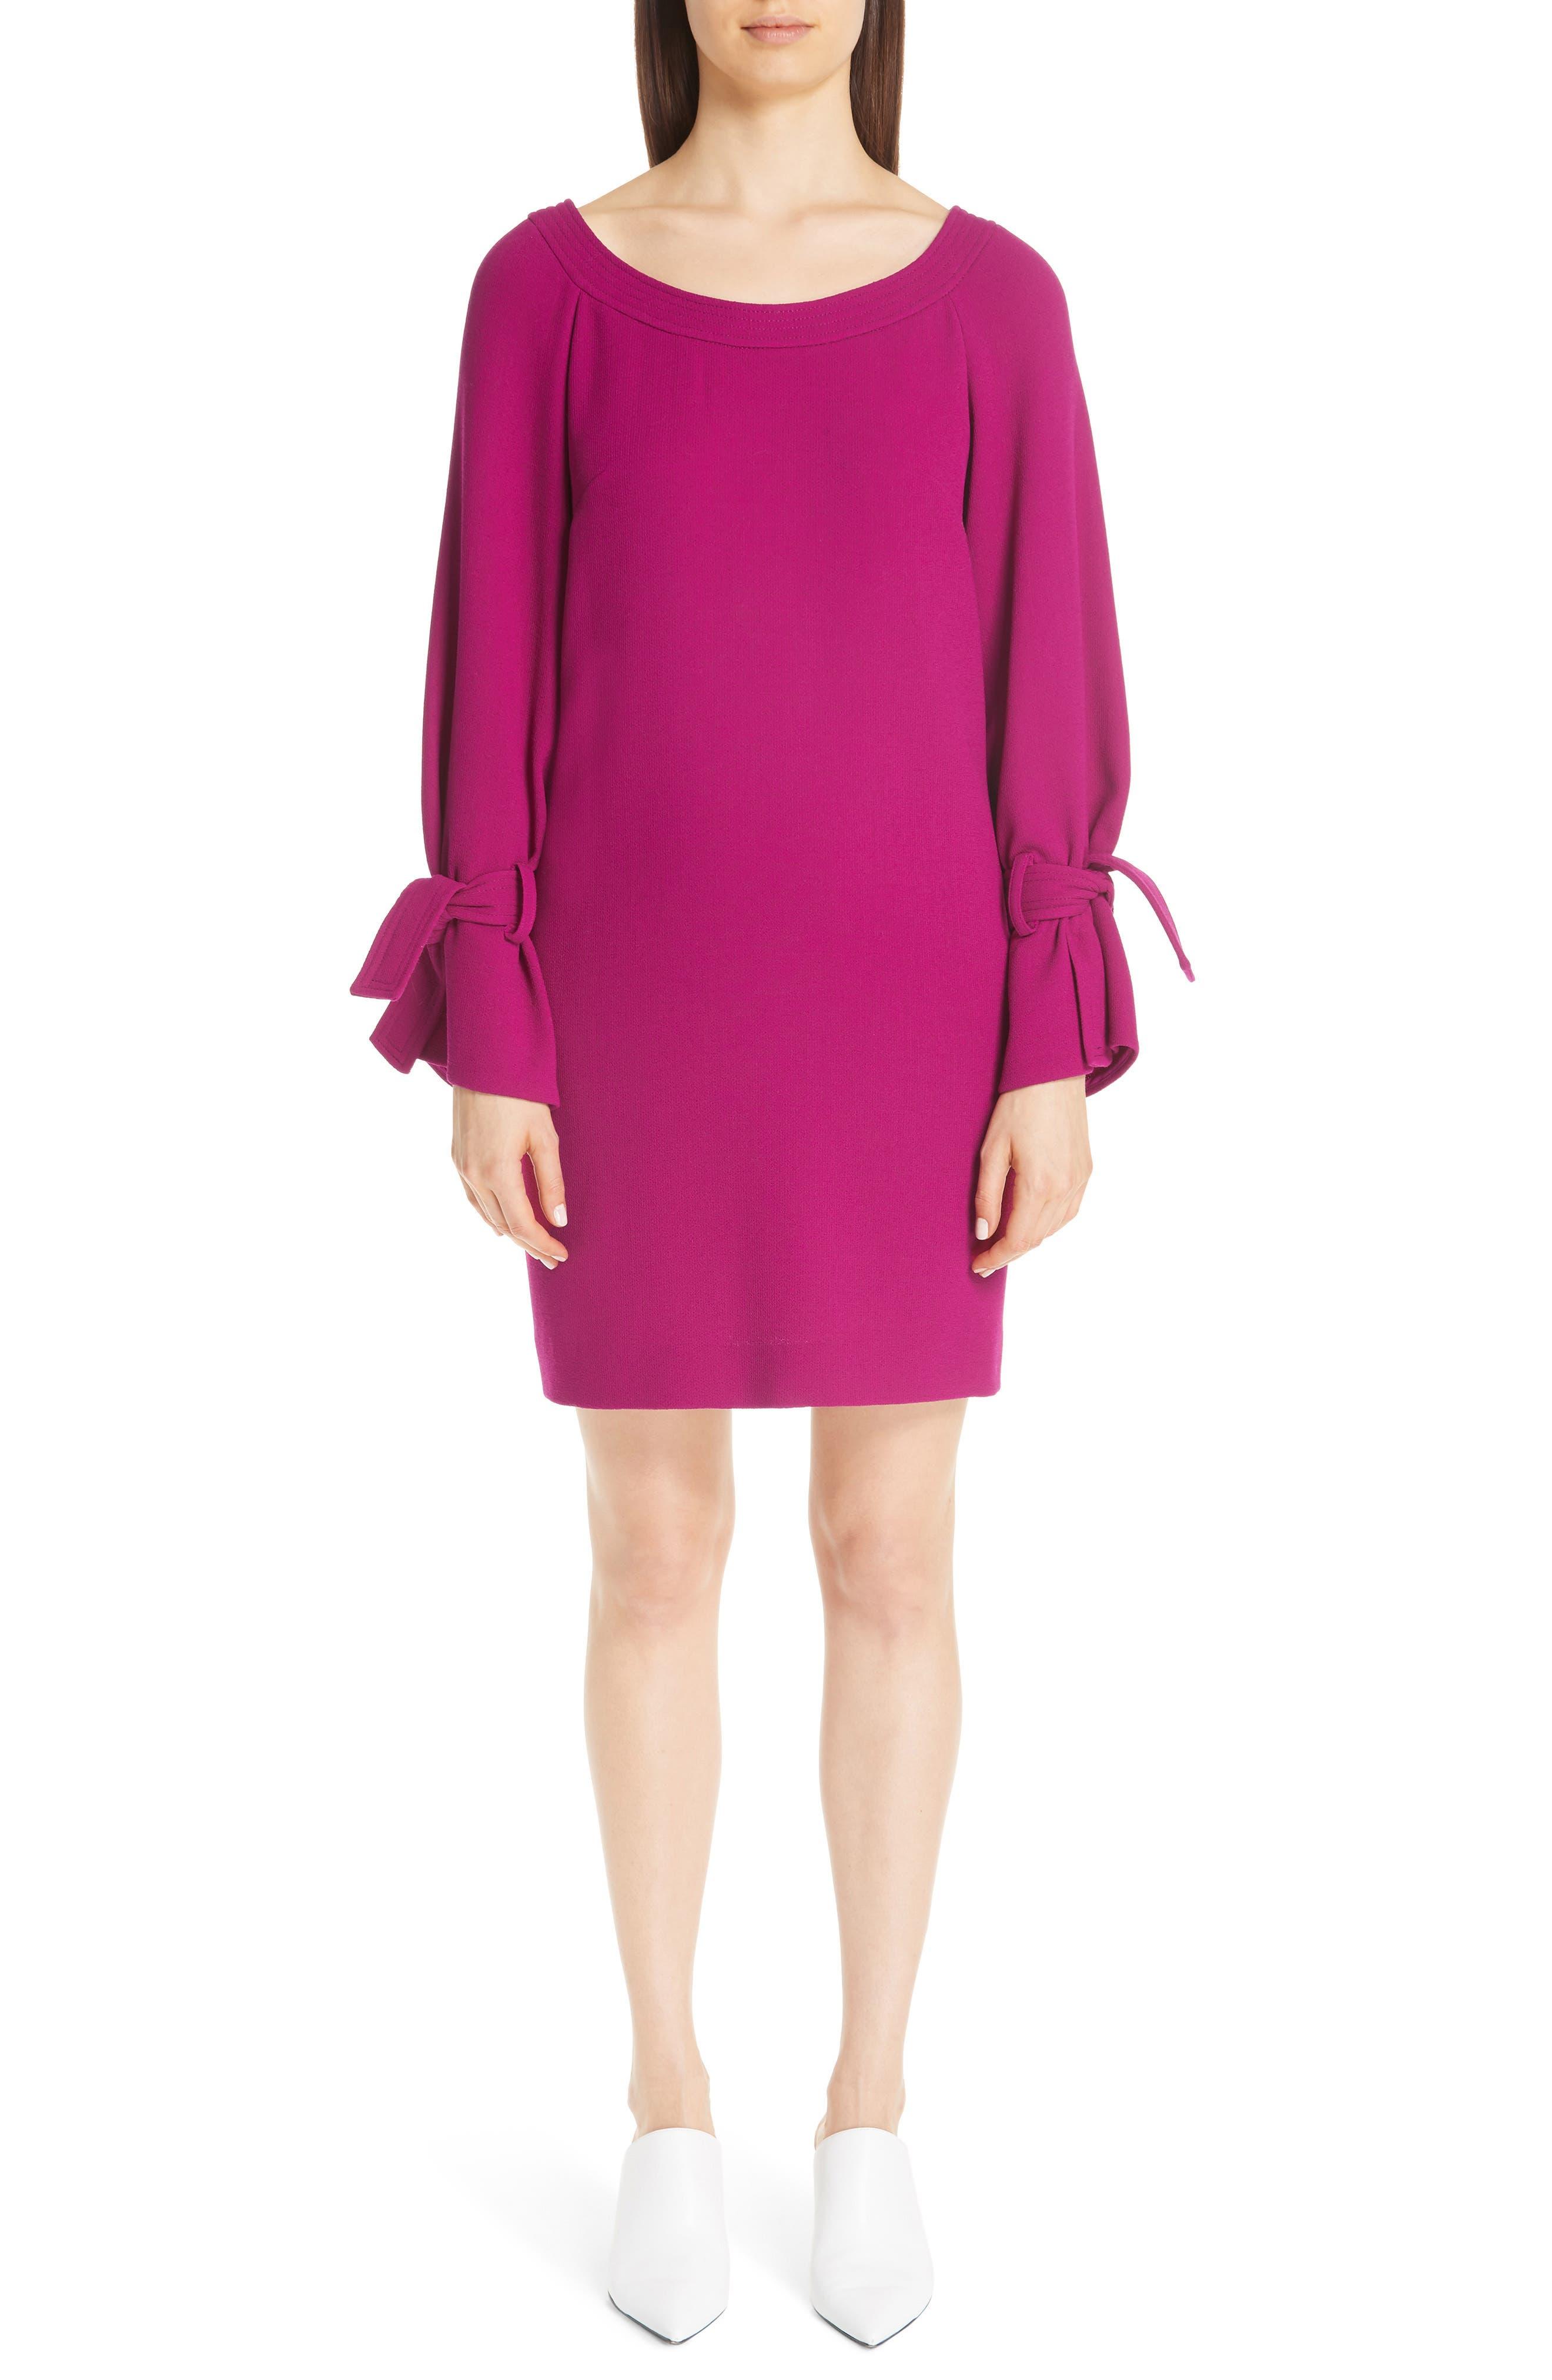 LELA ROSE, Tie Cuff Wool Blend Crepe Shift Dress, Main thumbnail 1, color, MAGENTA